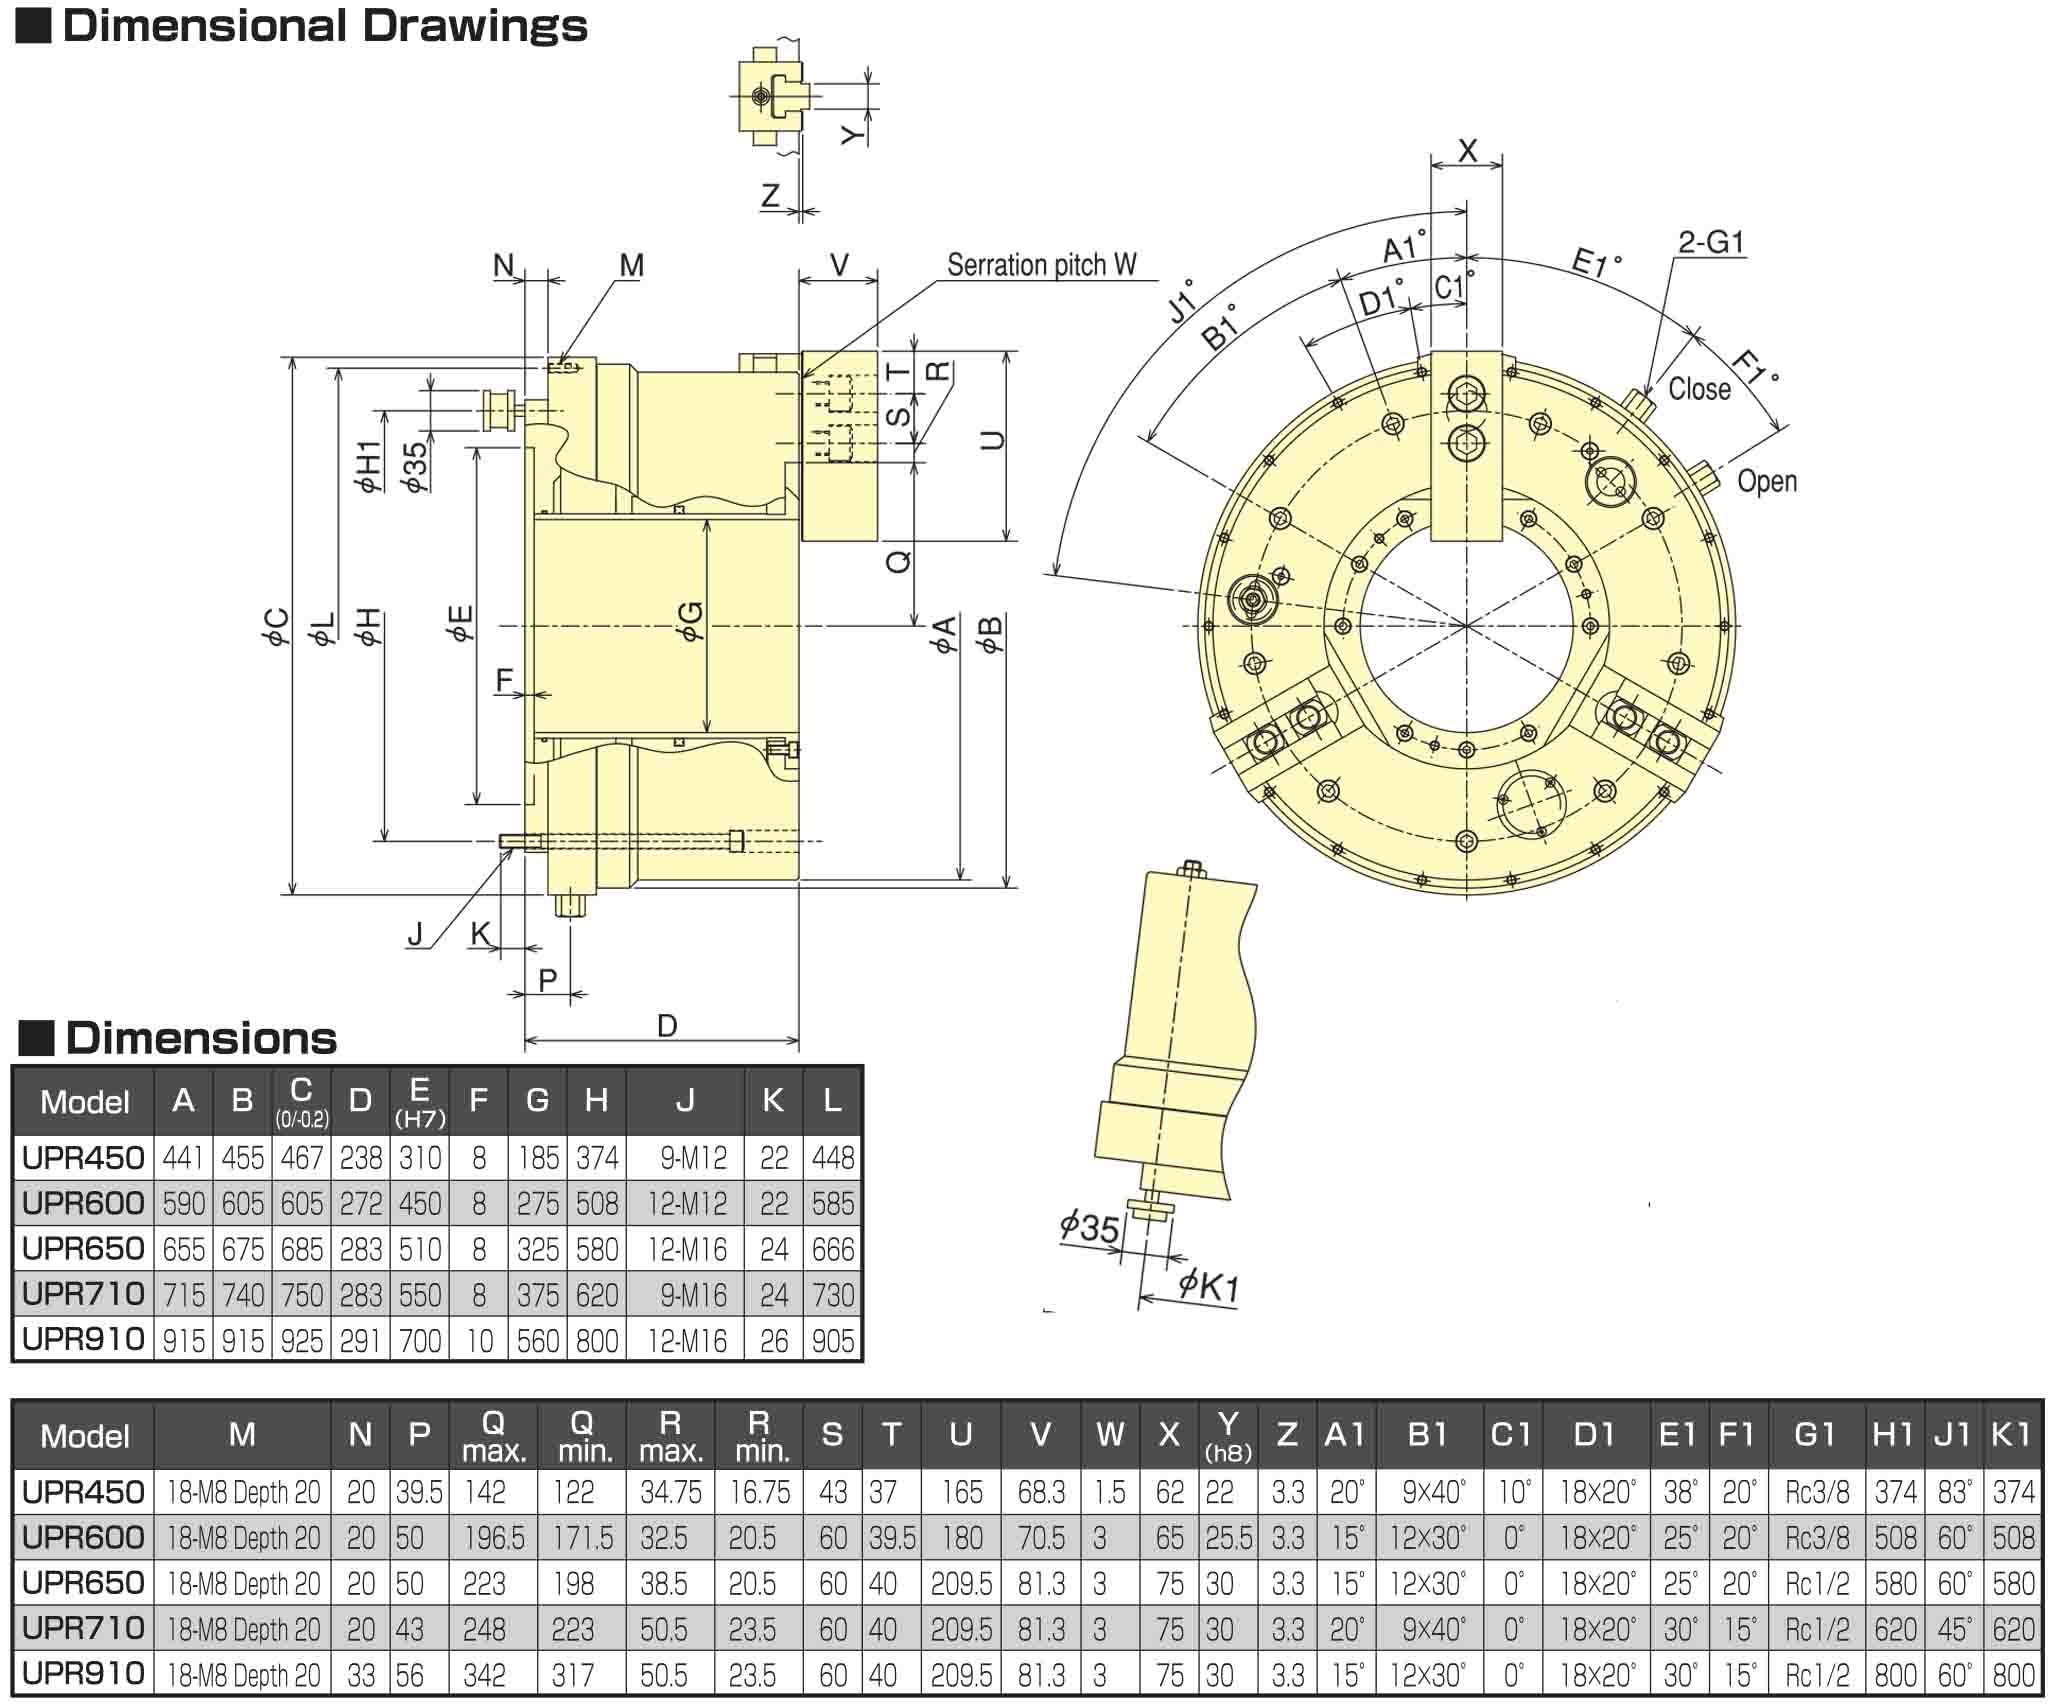 Kitagawa UPR710 Air-Operated Chuck Dimensional Drawings